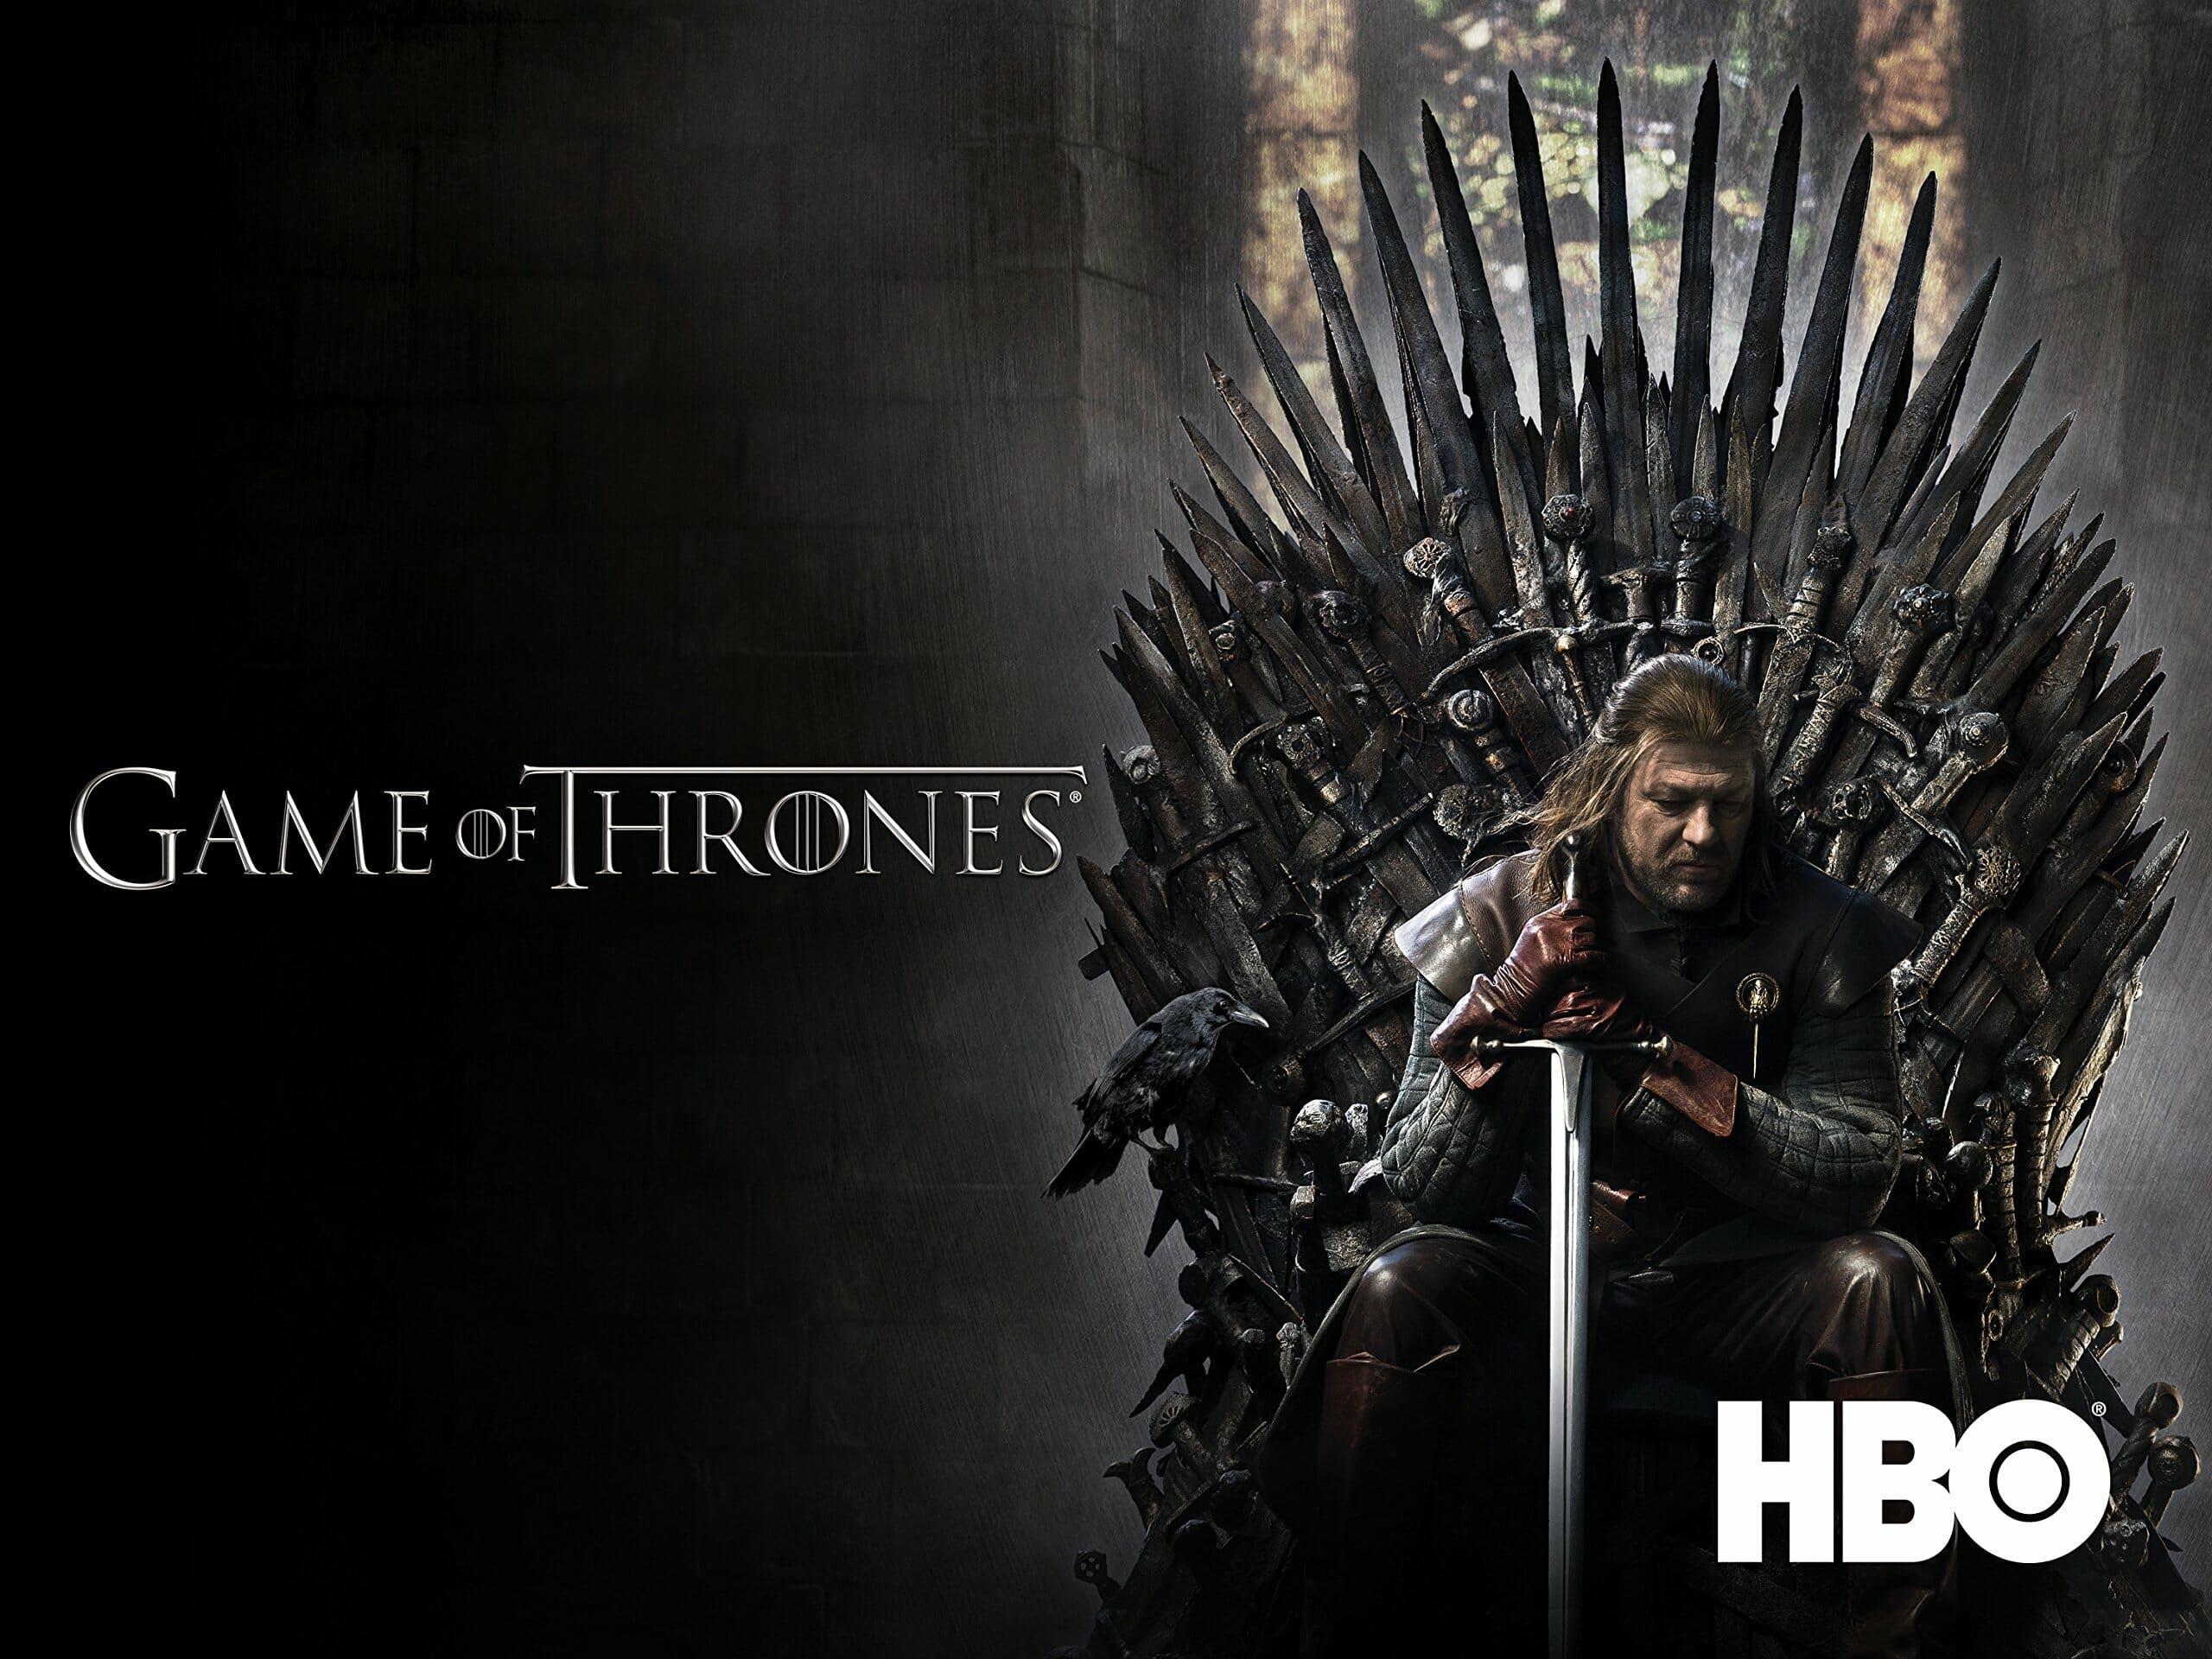 watch game of thrones season 8 episode 6 free on Amazon